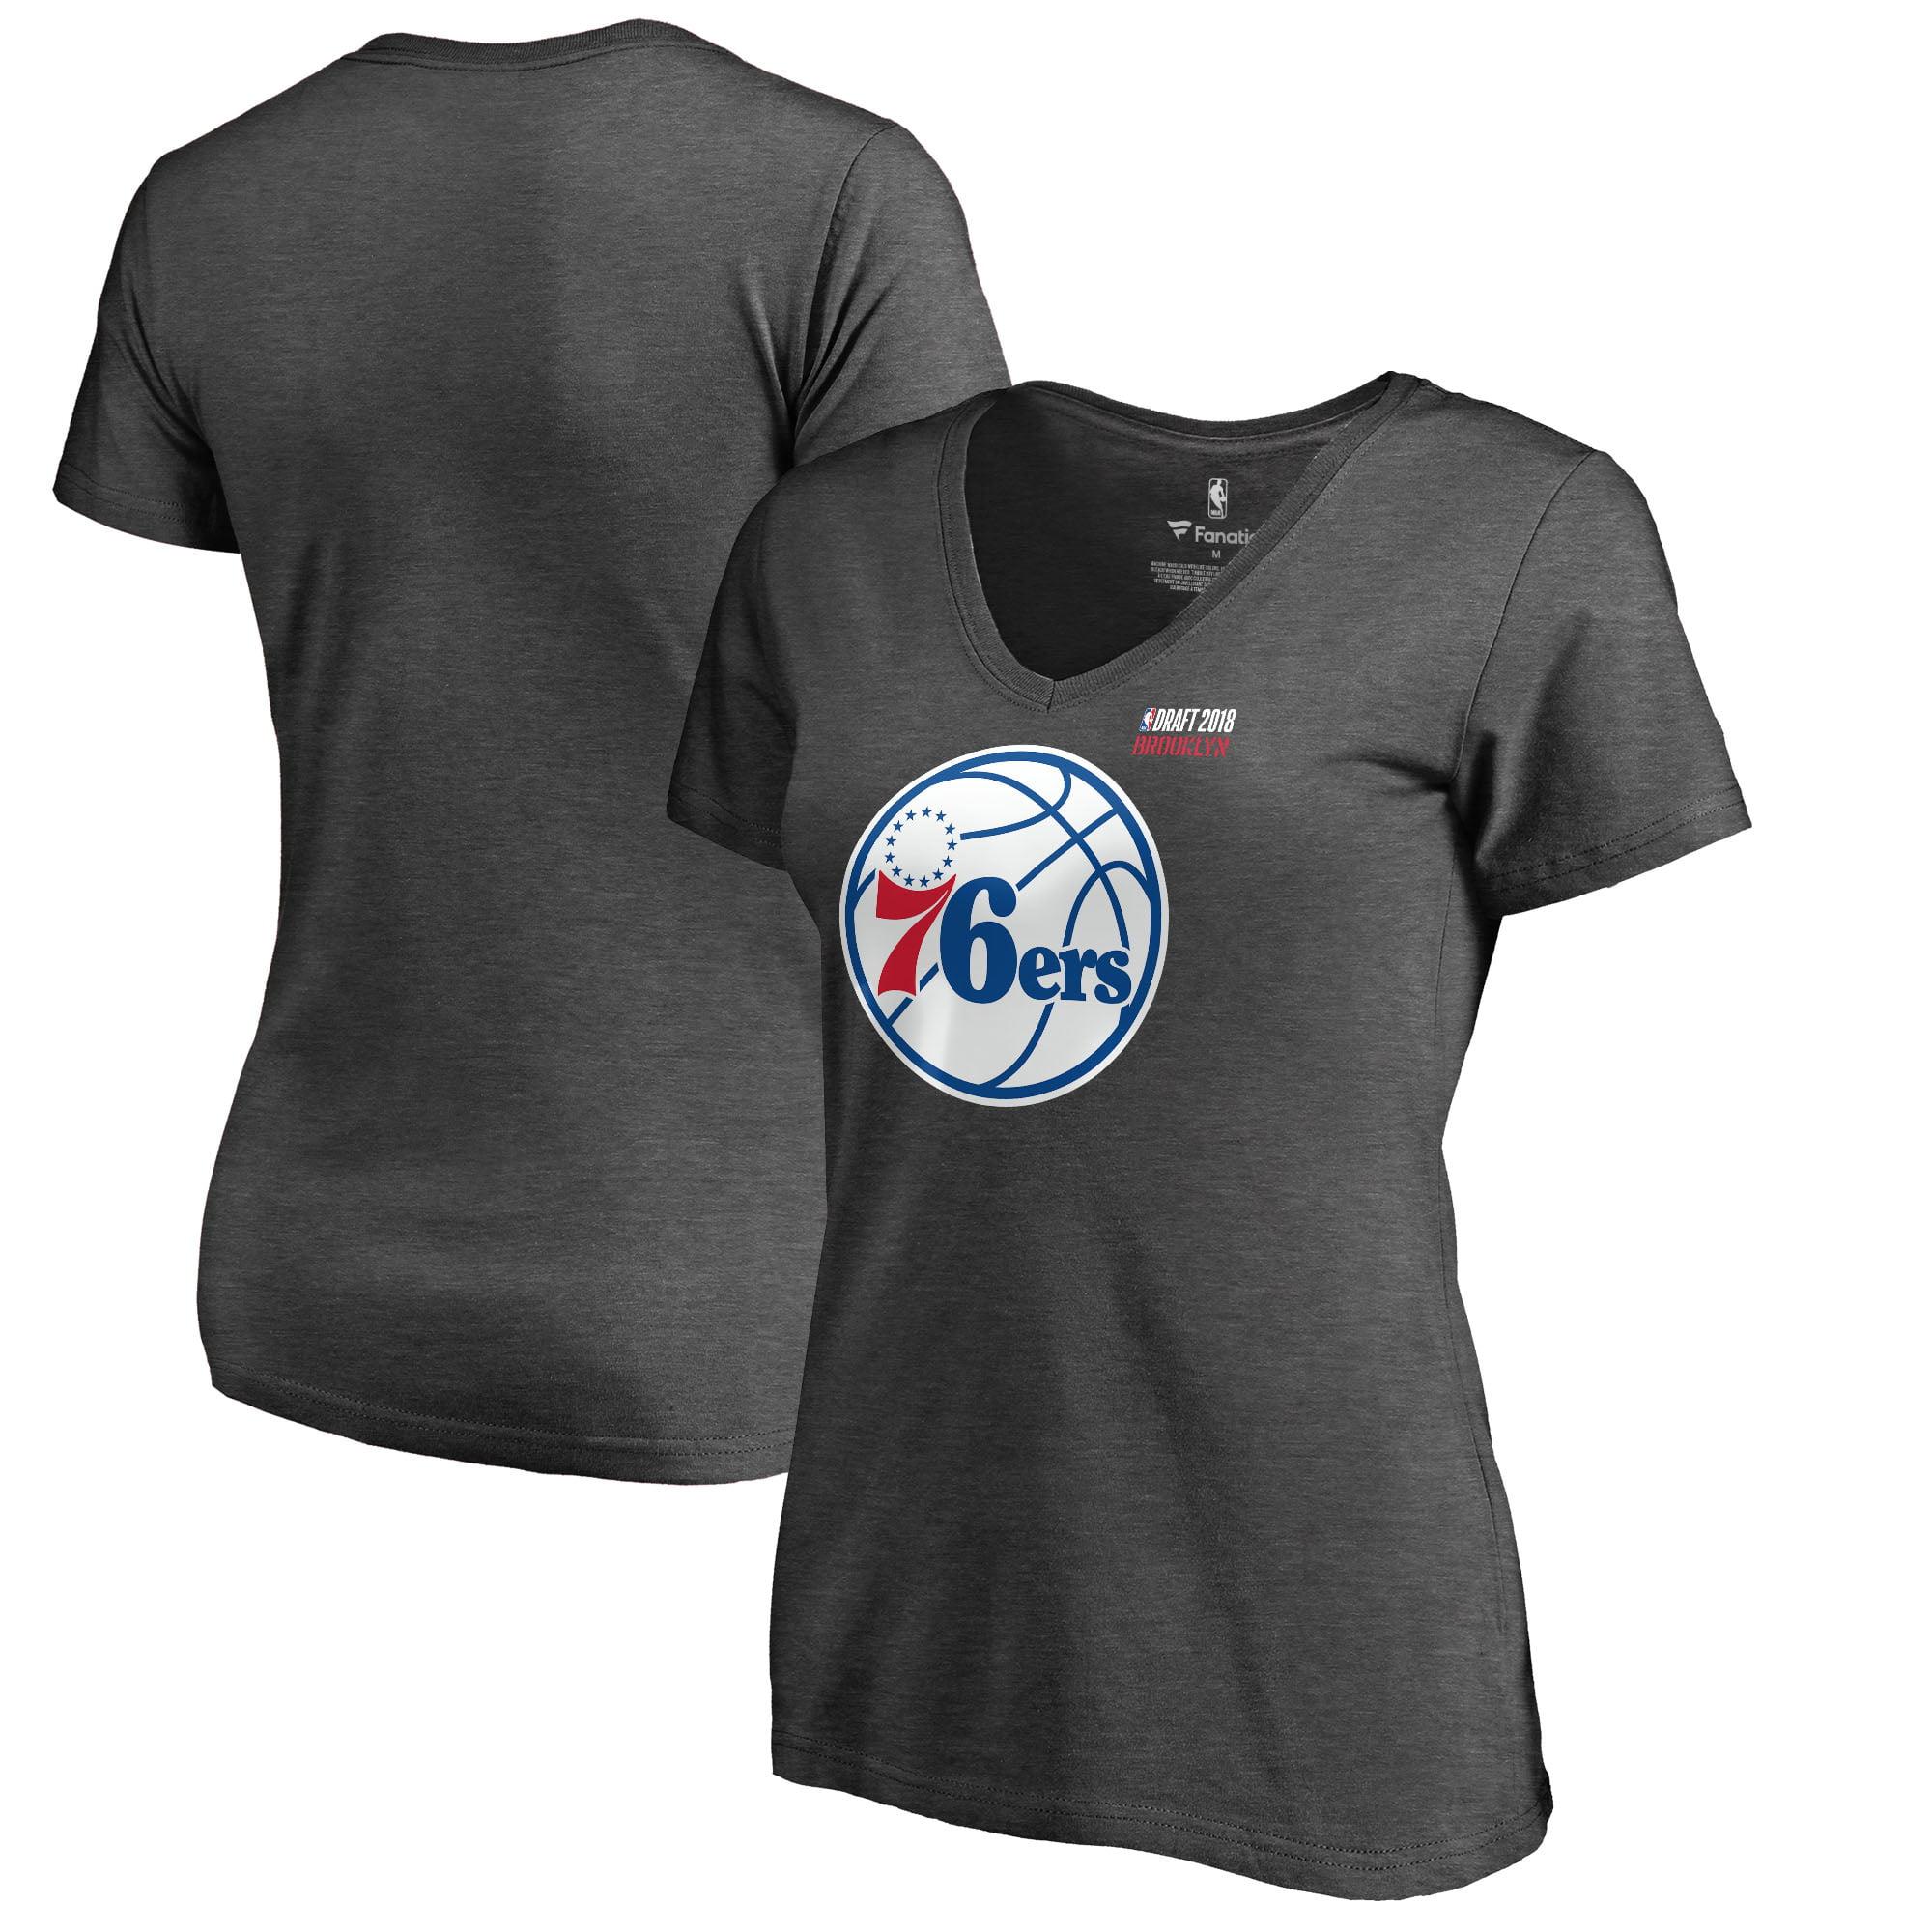 Philadelphia 76ers Fanatics Branded Women's 2018 NBA Draft BKLYN V-Neck T-Shirt - Heather Gray